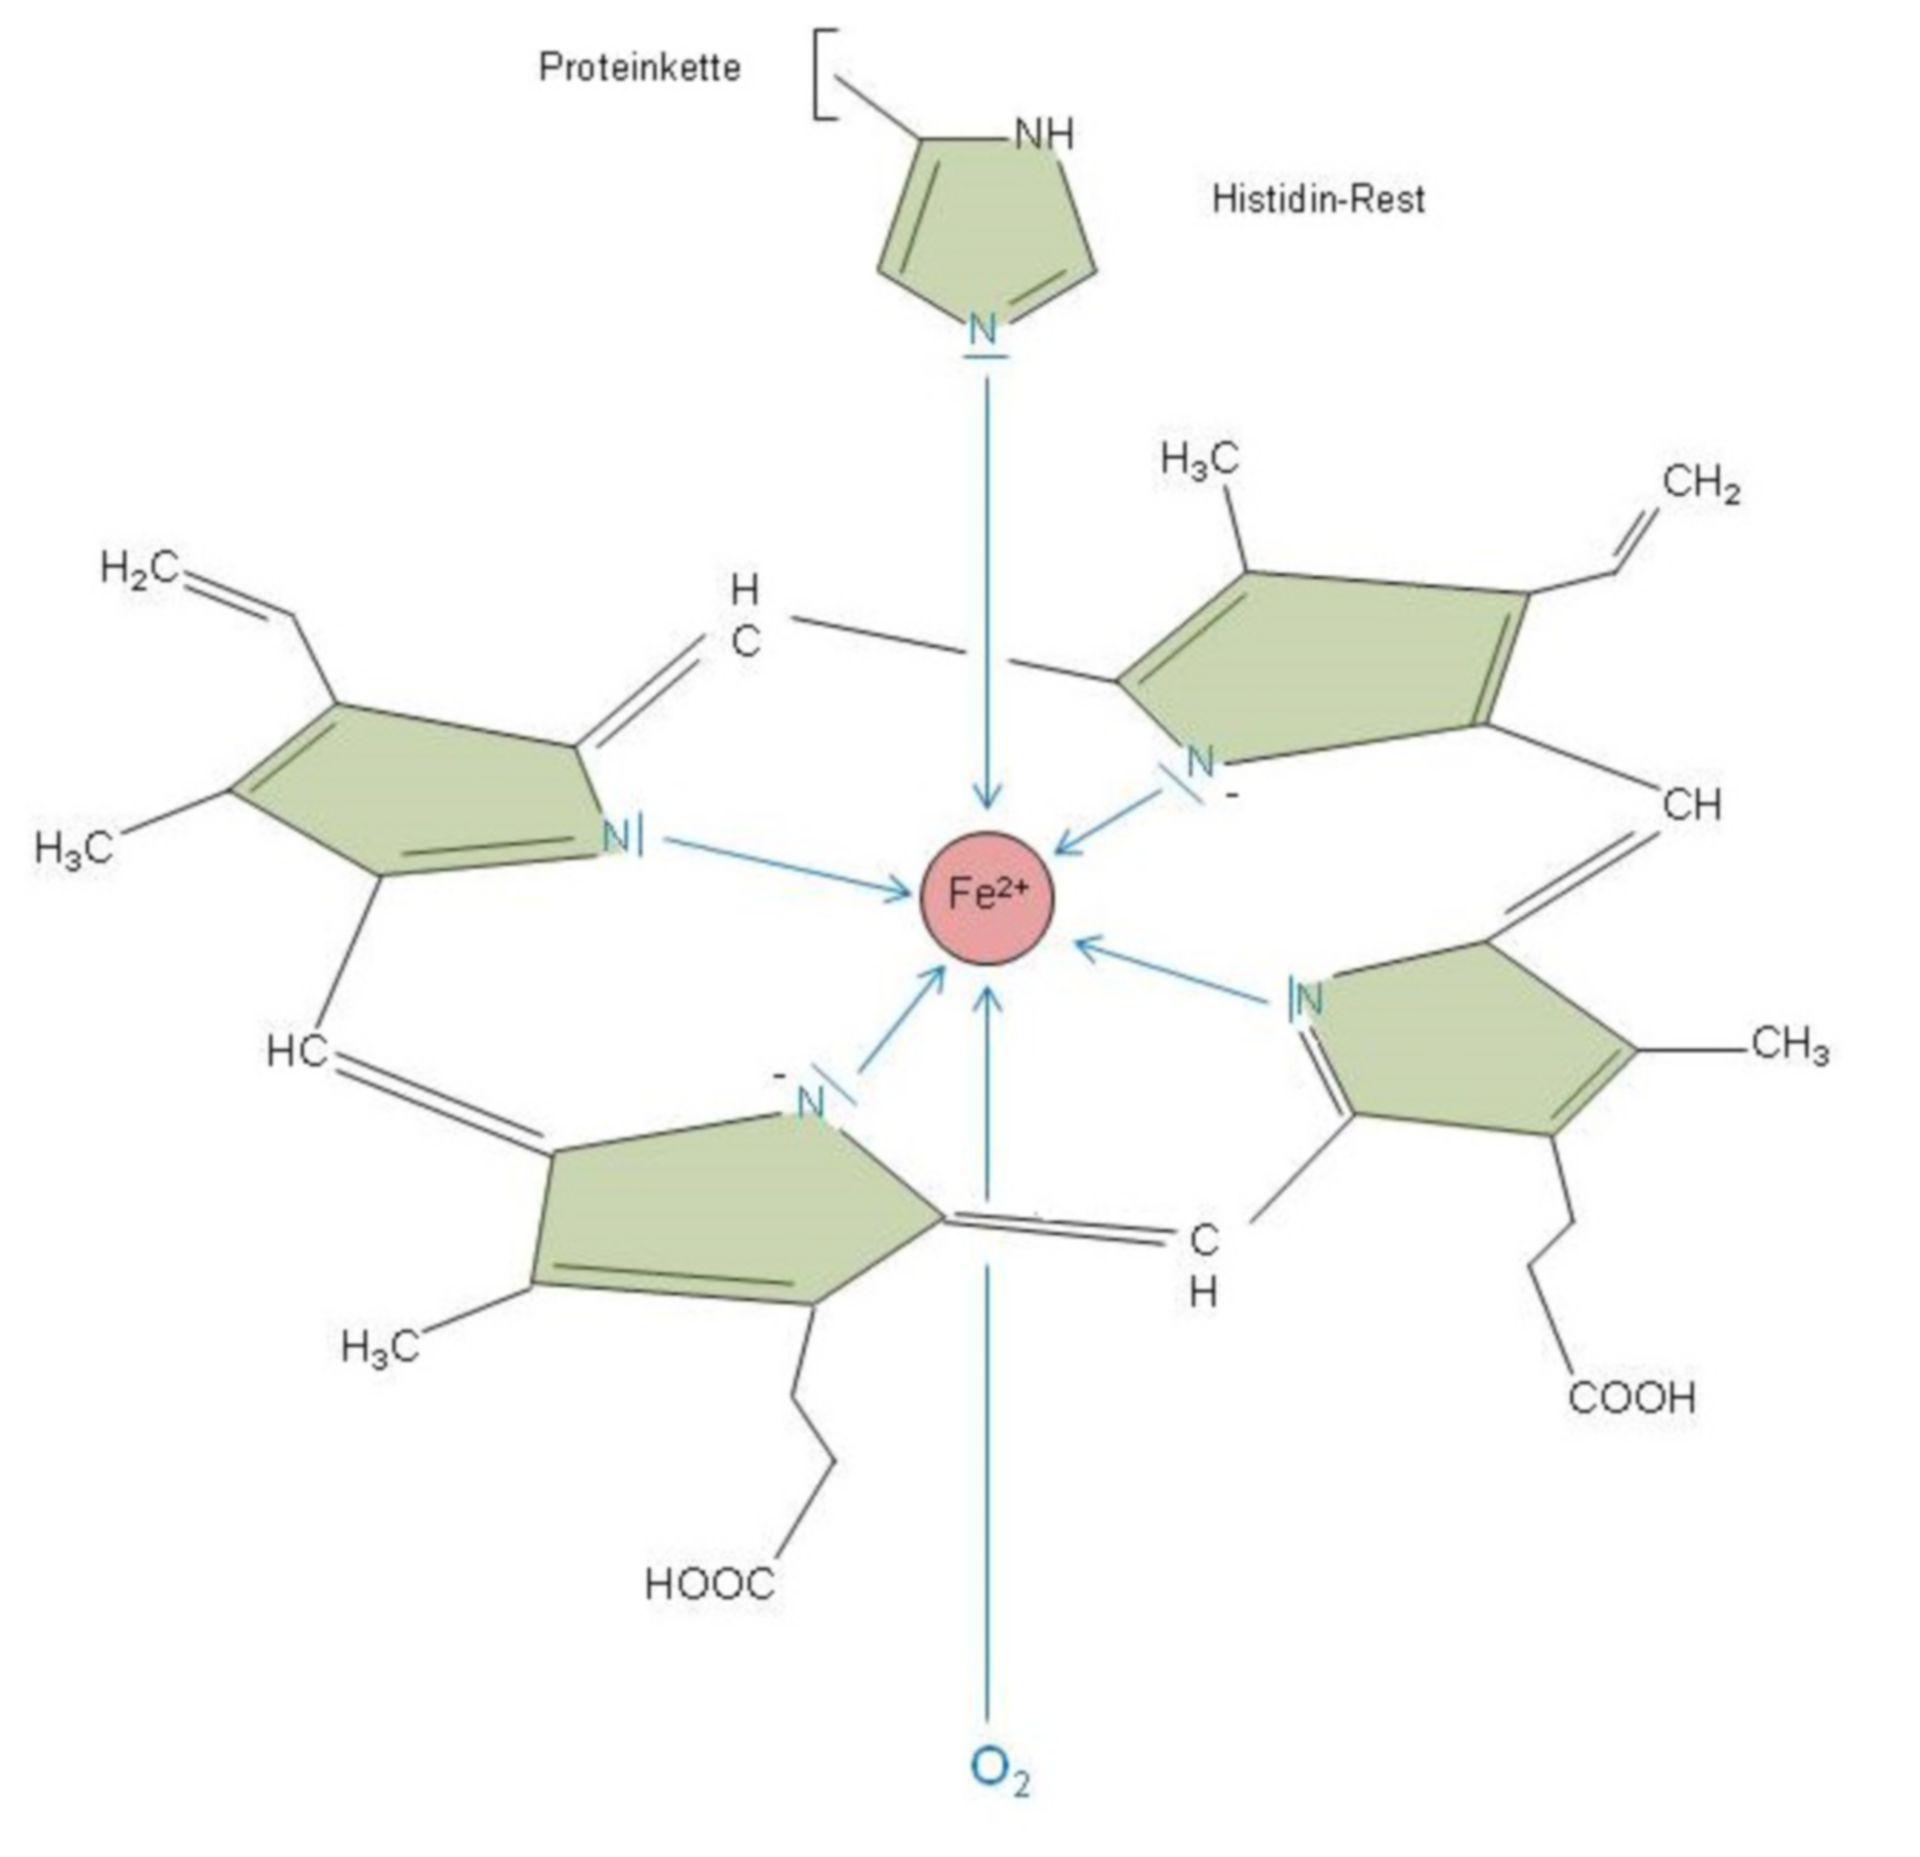 Struttura del eme con i leganti supplementari emoglobina - Patrick Messner